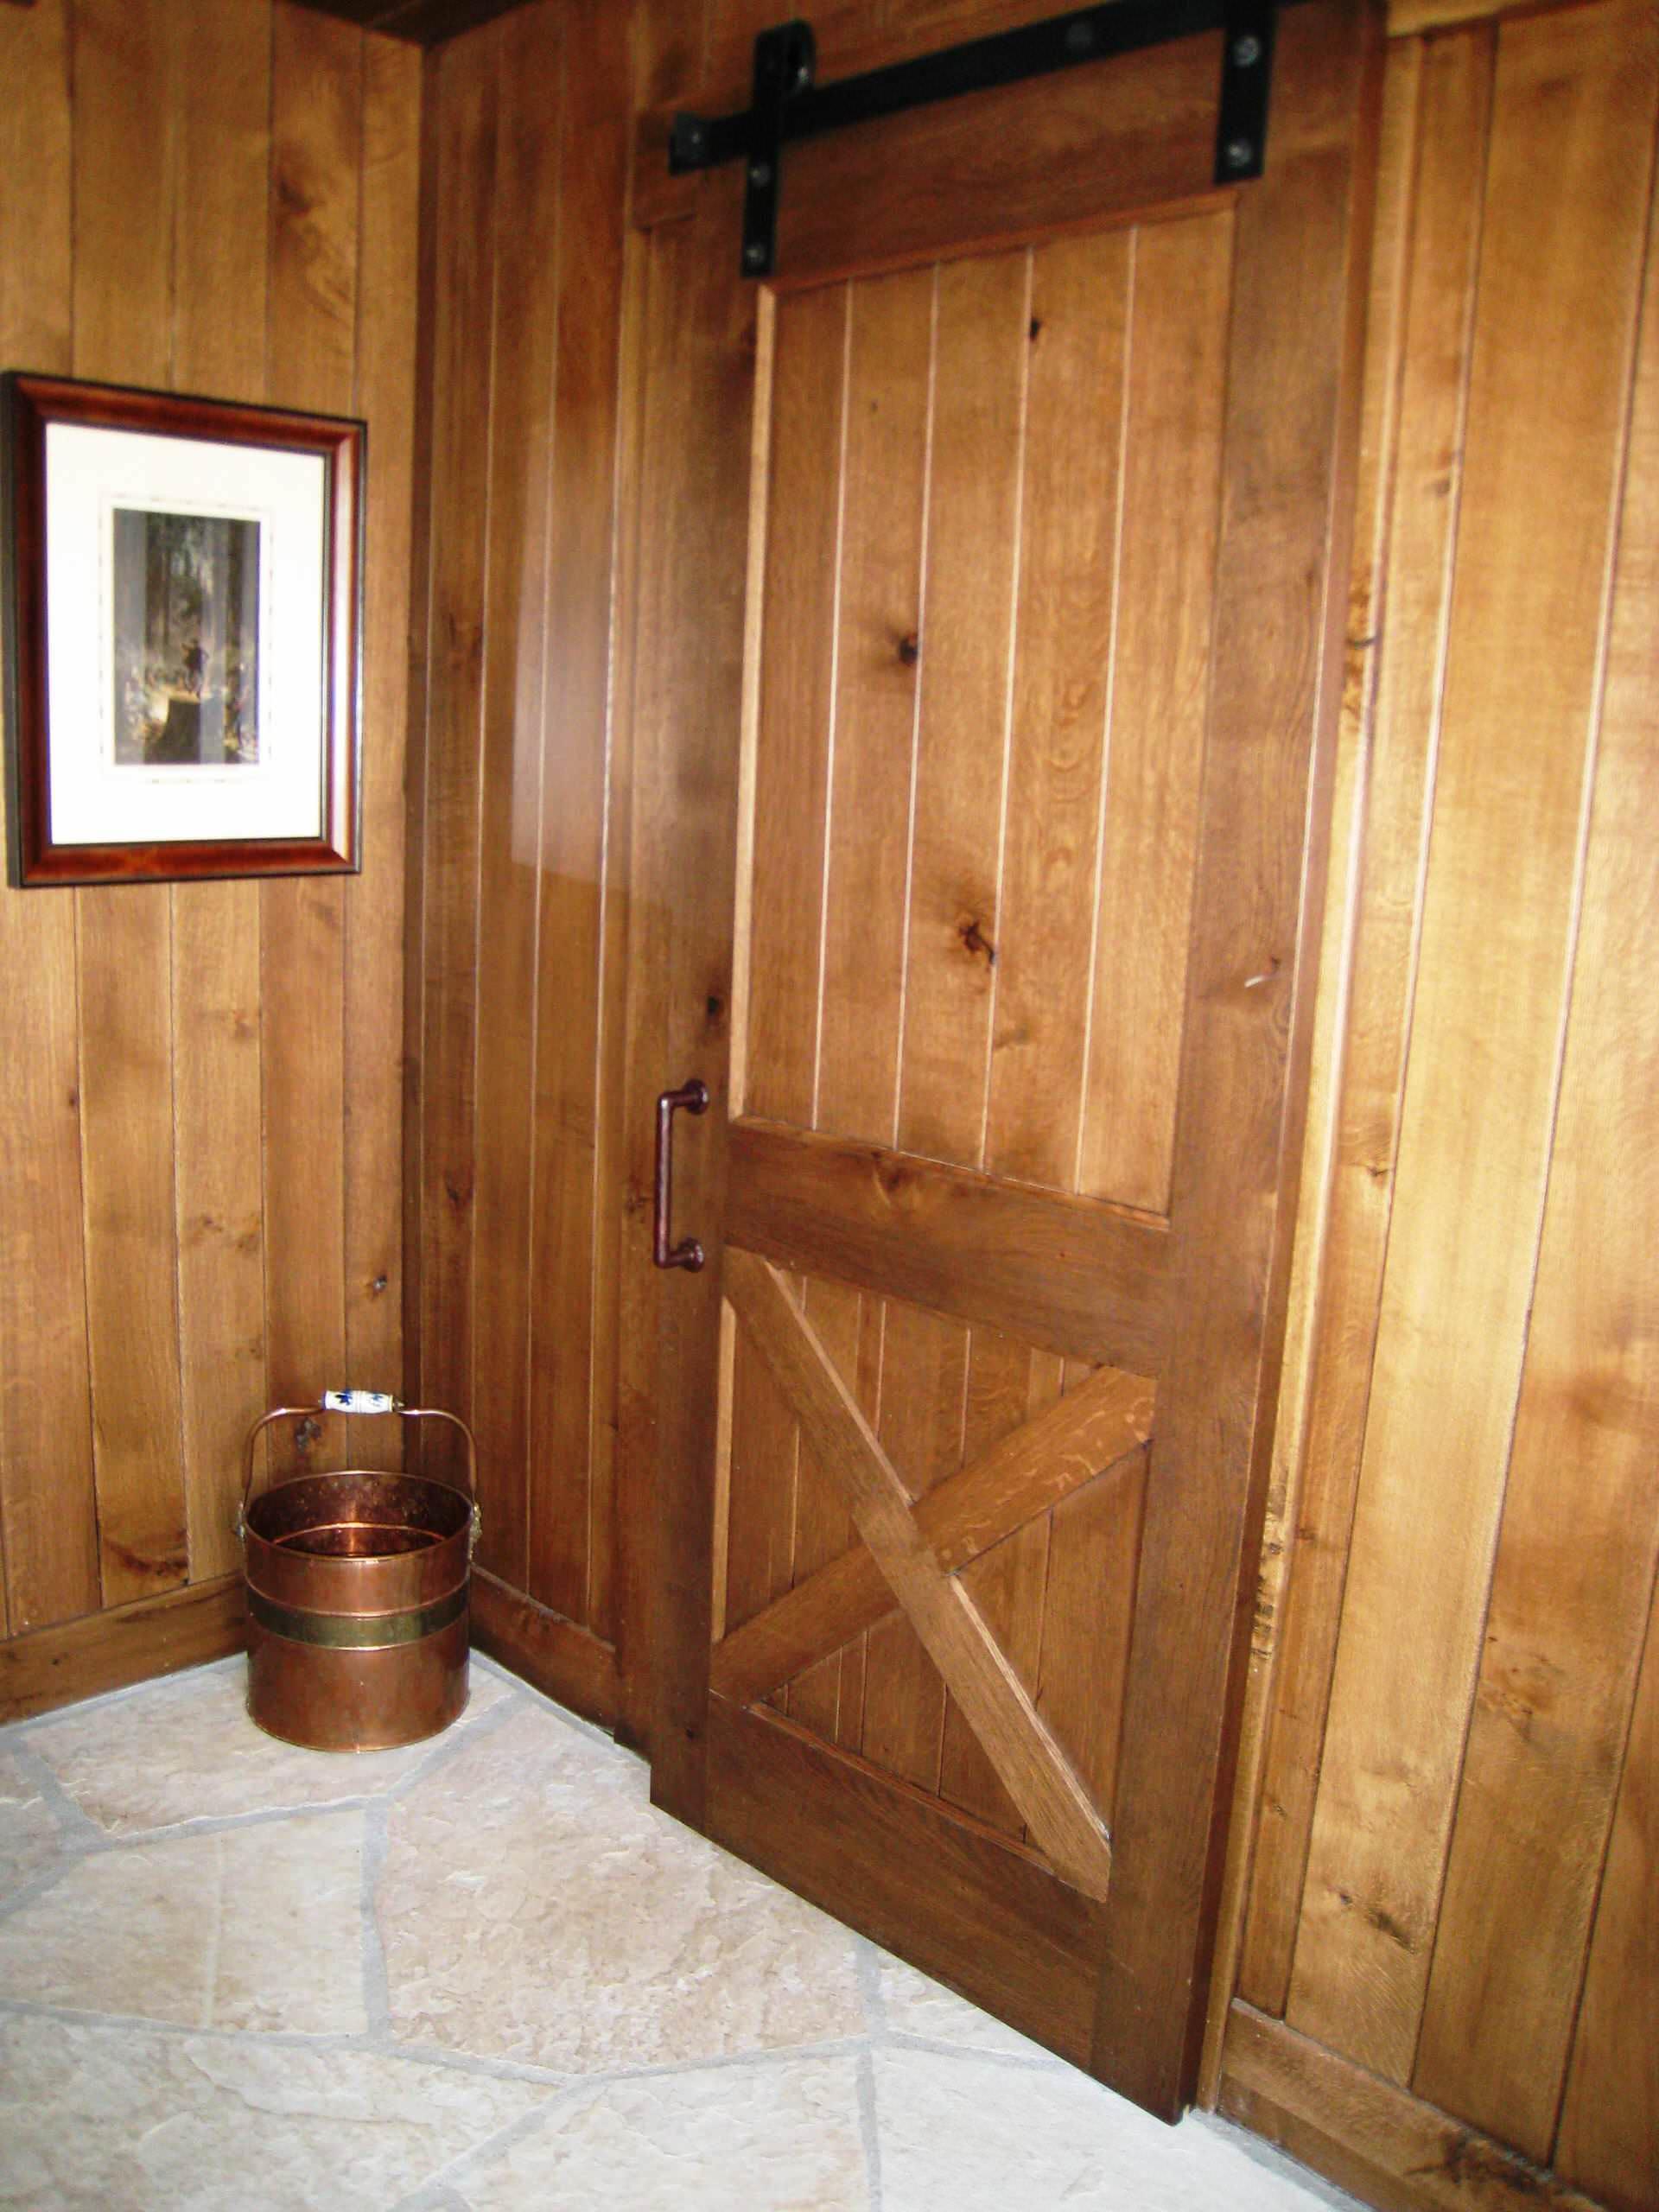 Barn door on sliding hardware